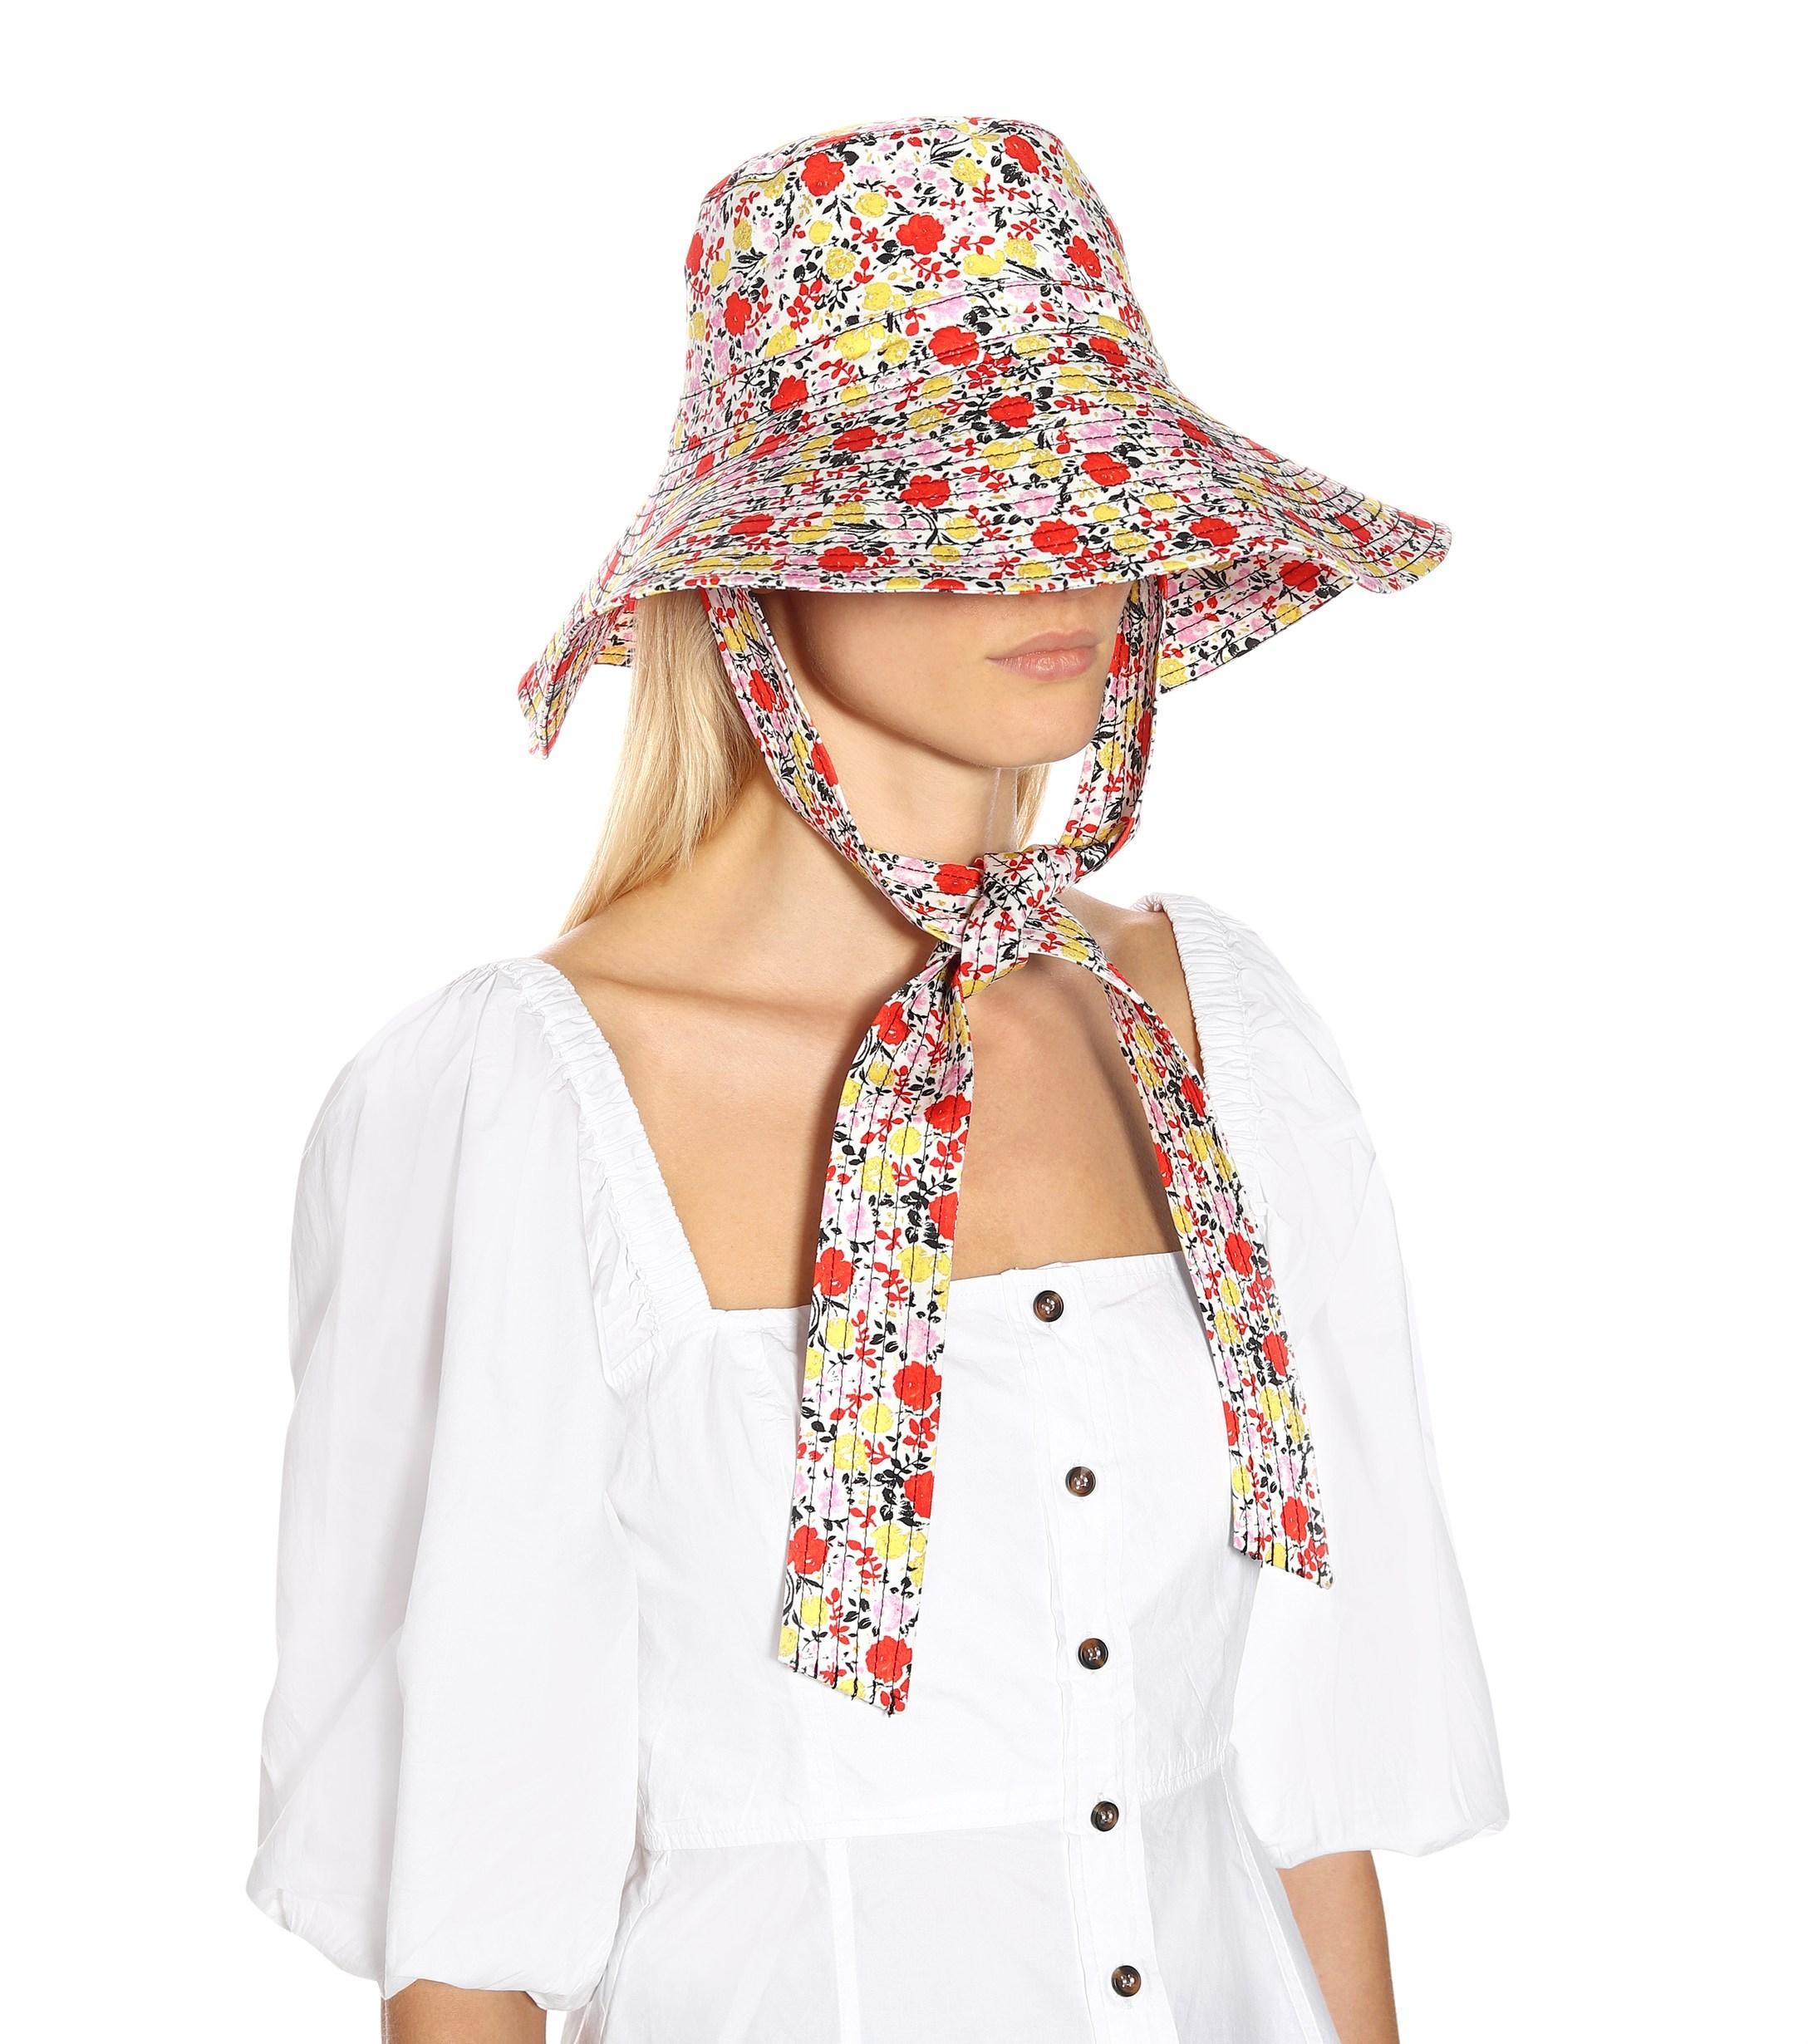 ab2b3186c15e0 Ganni Exclusive To Mytheresa – Floral Wide-brim Hat - Lyst